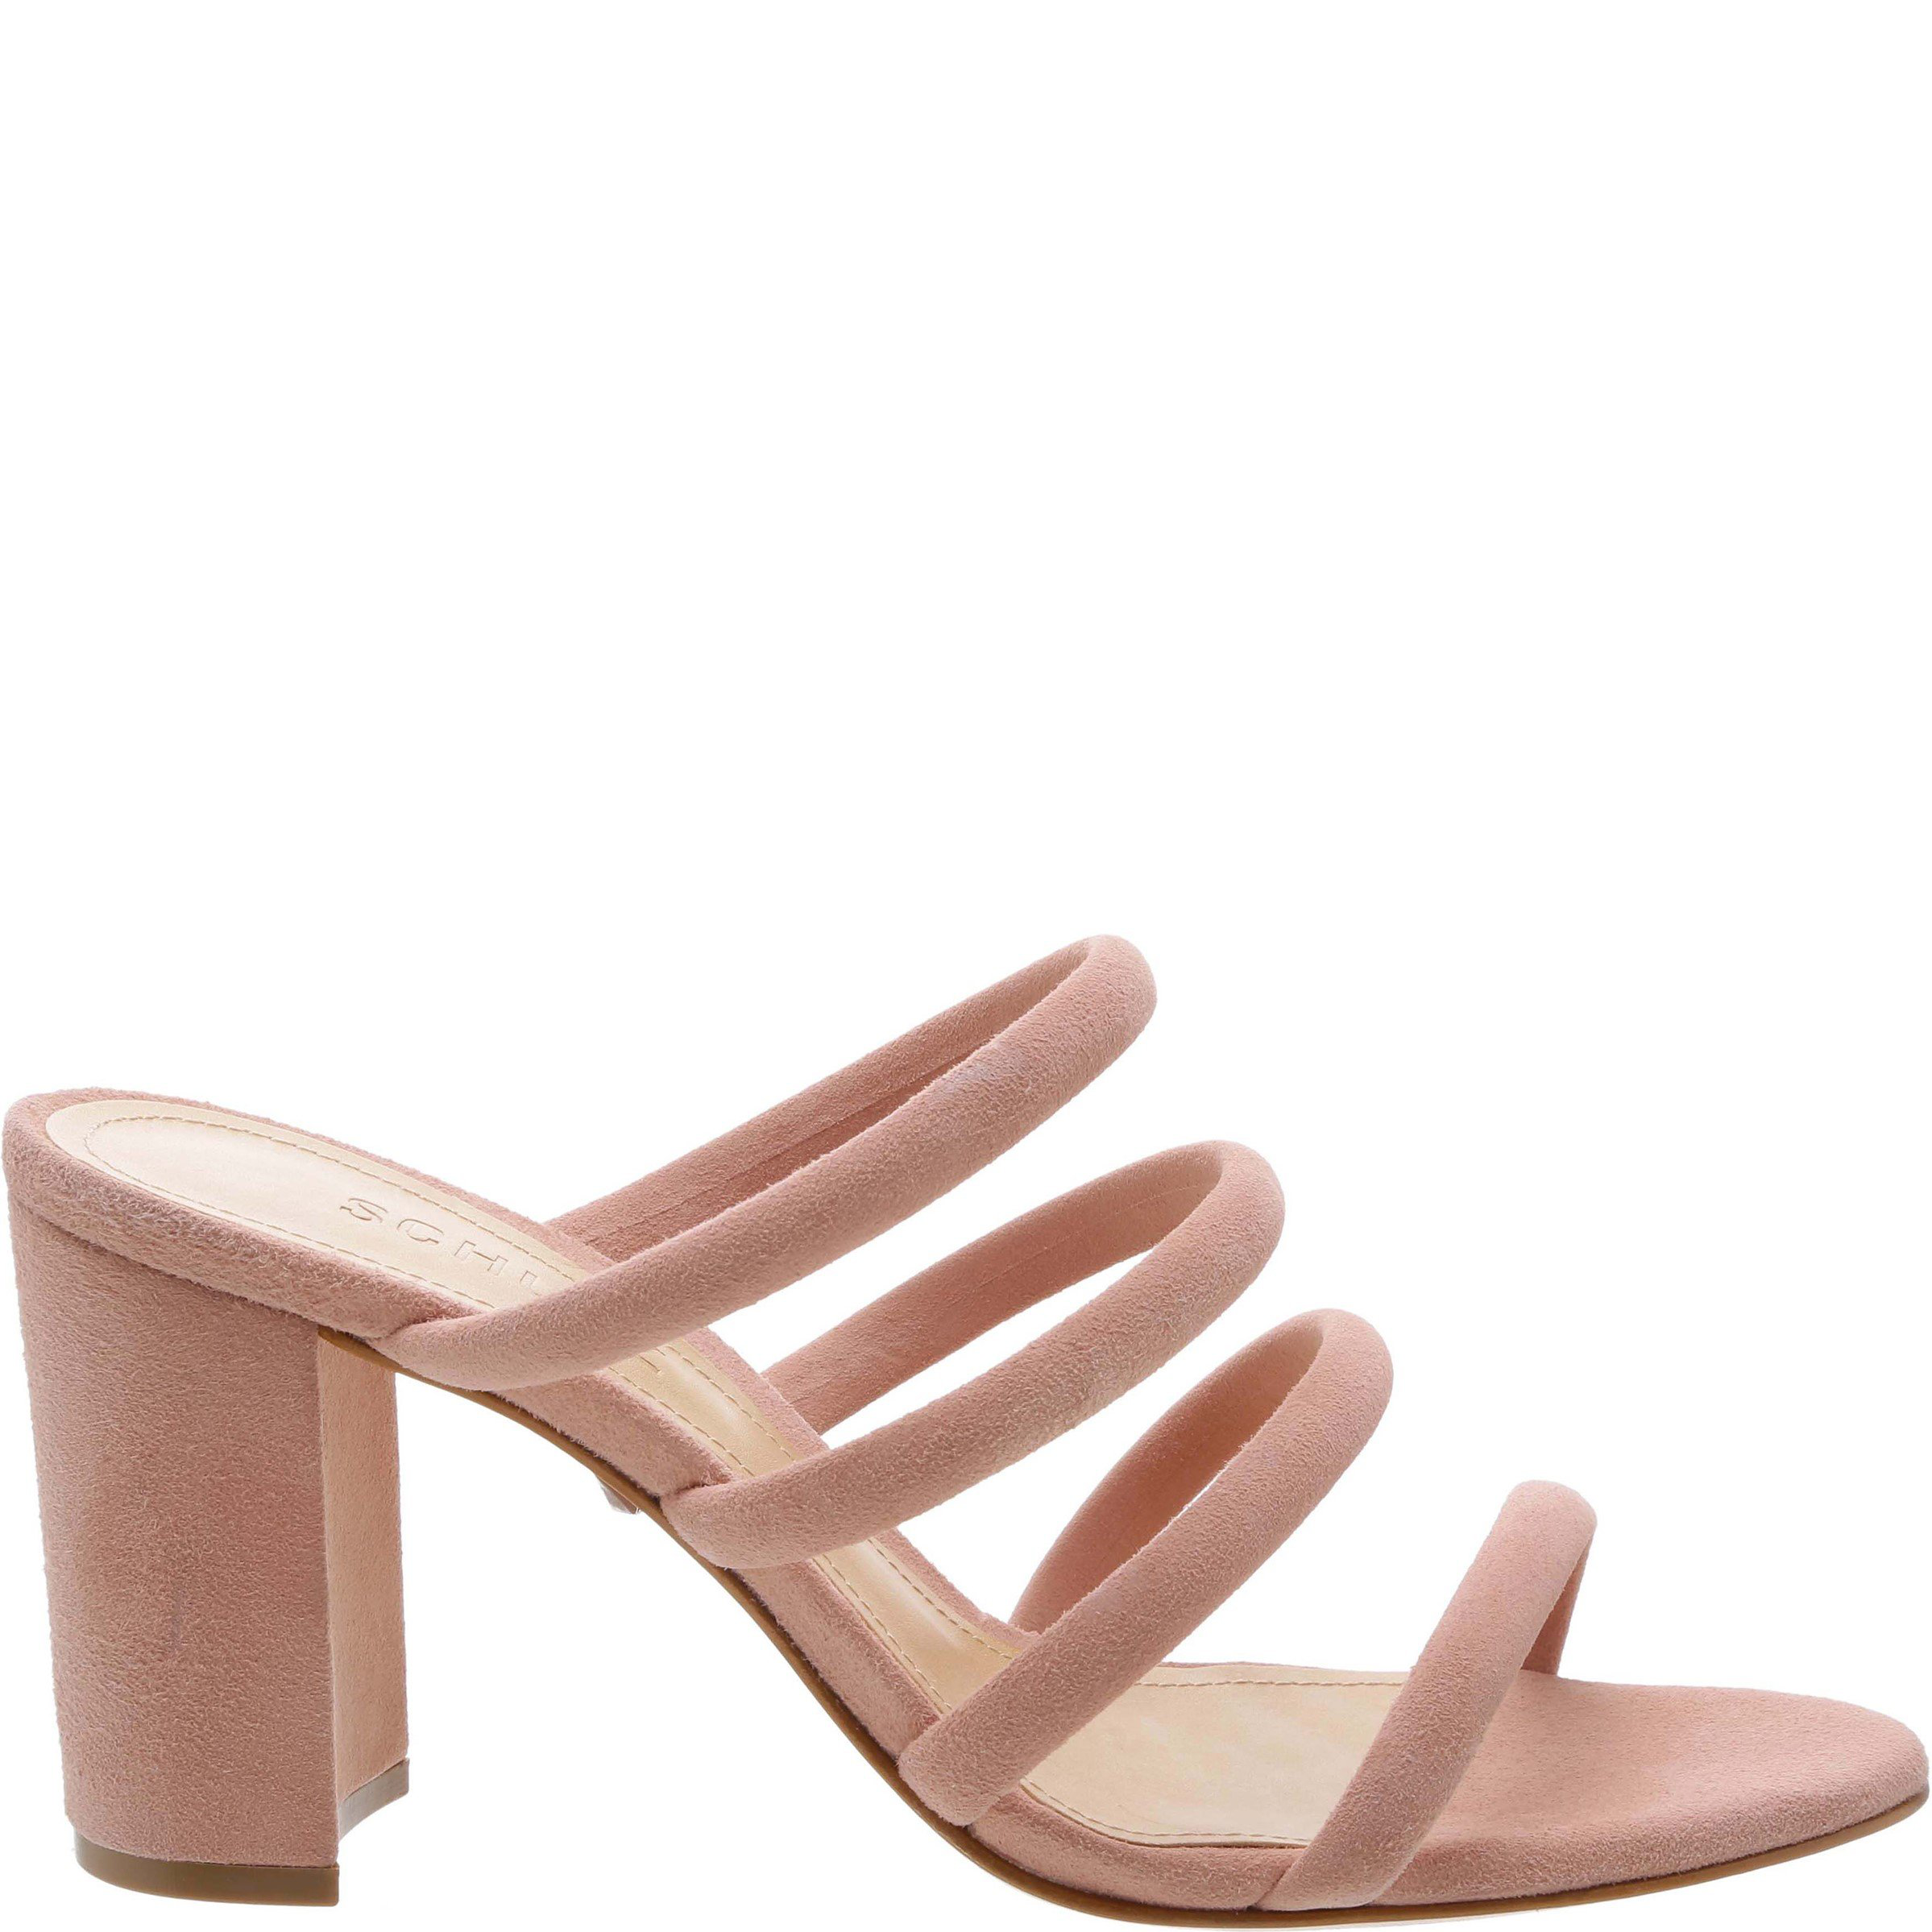 847eb996f45e Minimalist tube straps heighten the contemporary-chic appeal of this block-heel  sandal. Style Name  Schutz Felisa Block Heel Sandal (Women).